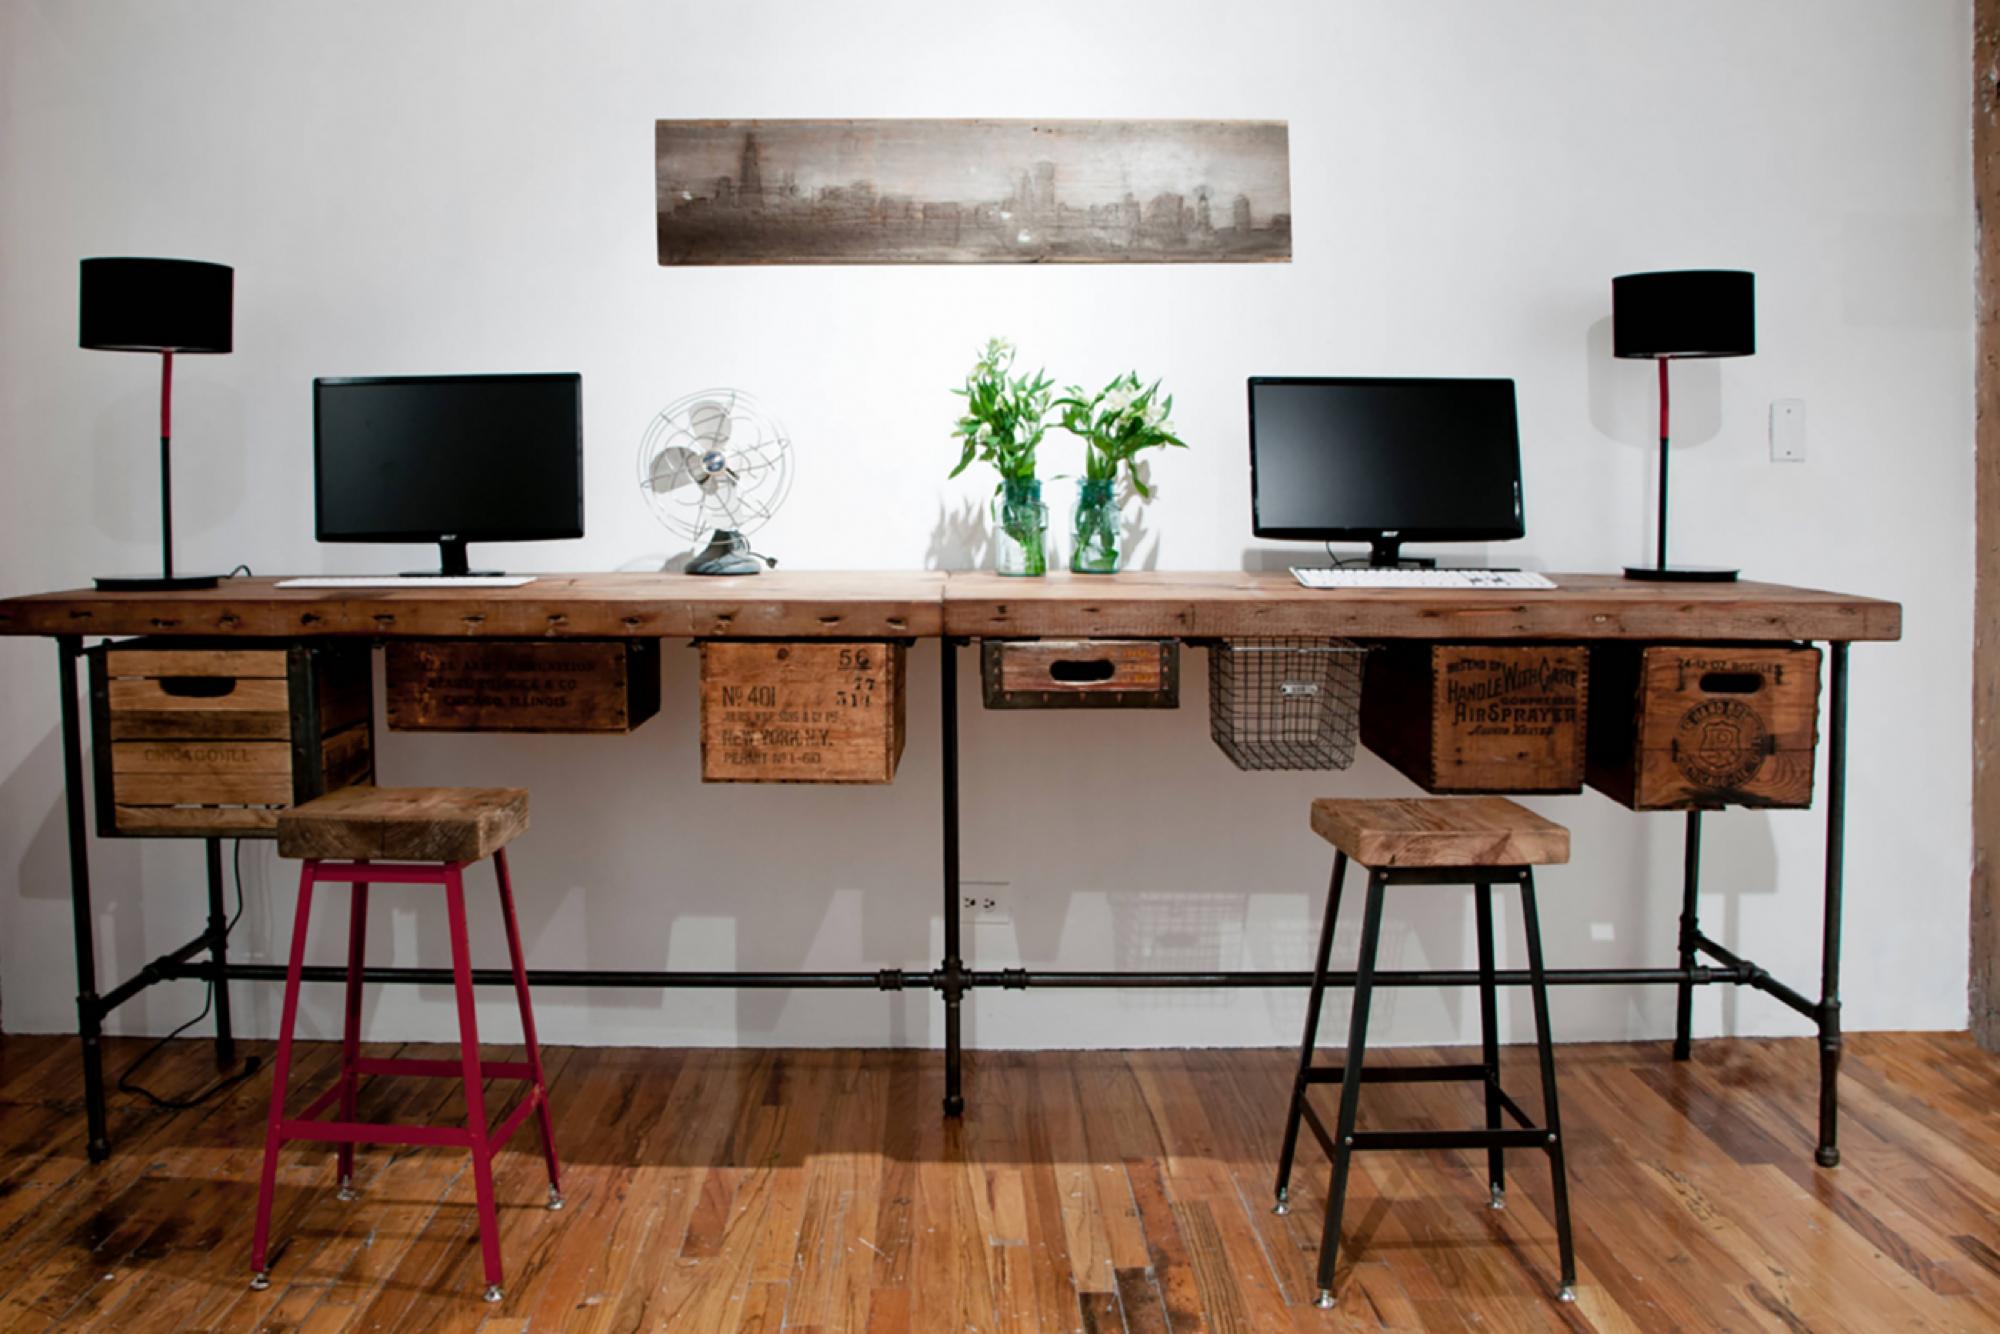 & 12 Ideas for Creative Desks